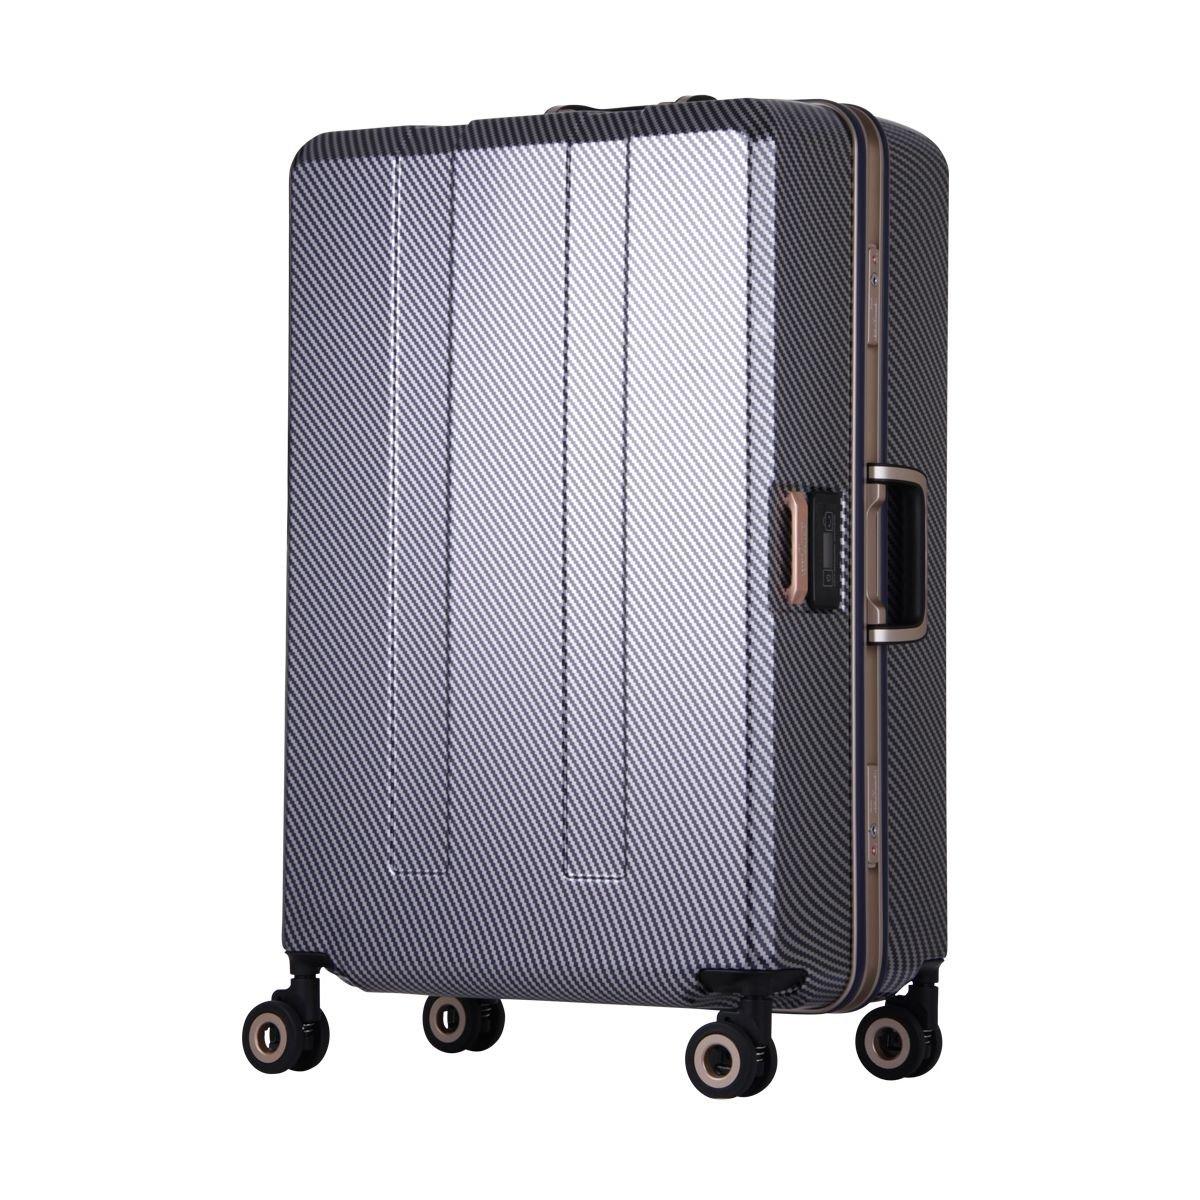 LEGEND WALKER レジェンドウォーカー スーツケース 6703N-70 B076DXFYC5 ネイビーカーボン ネイビーカーボン